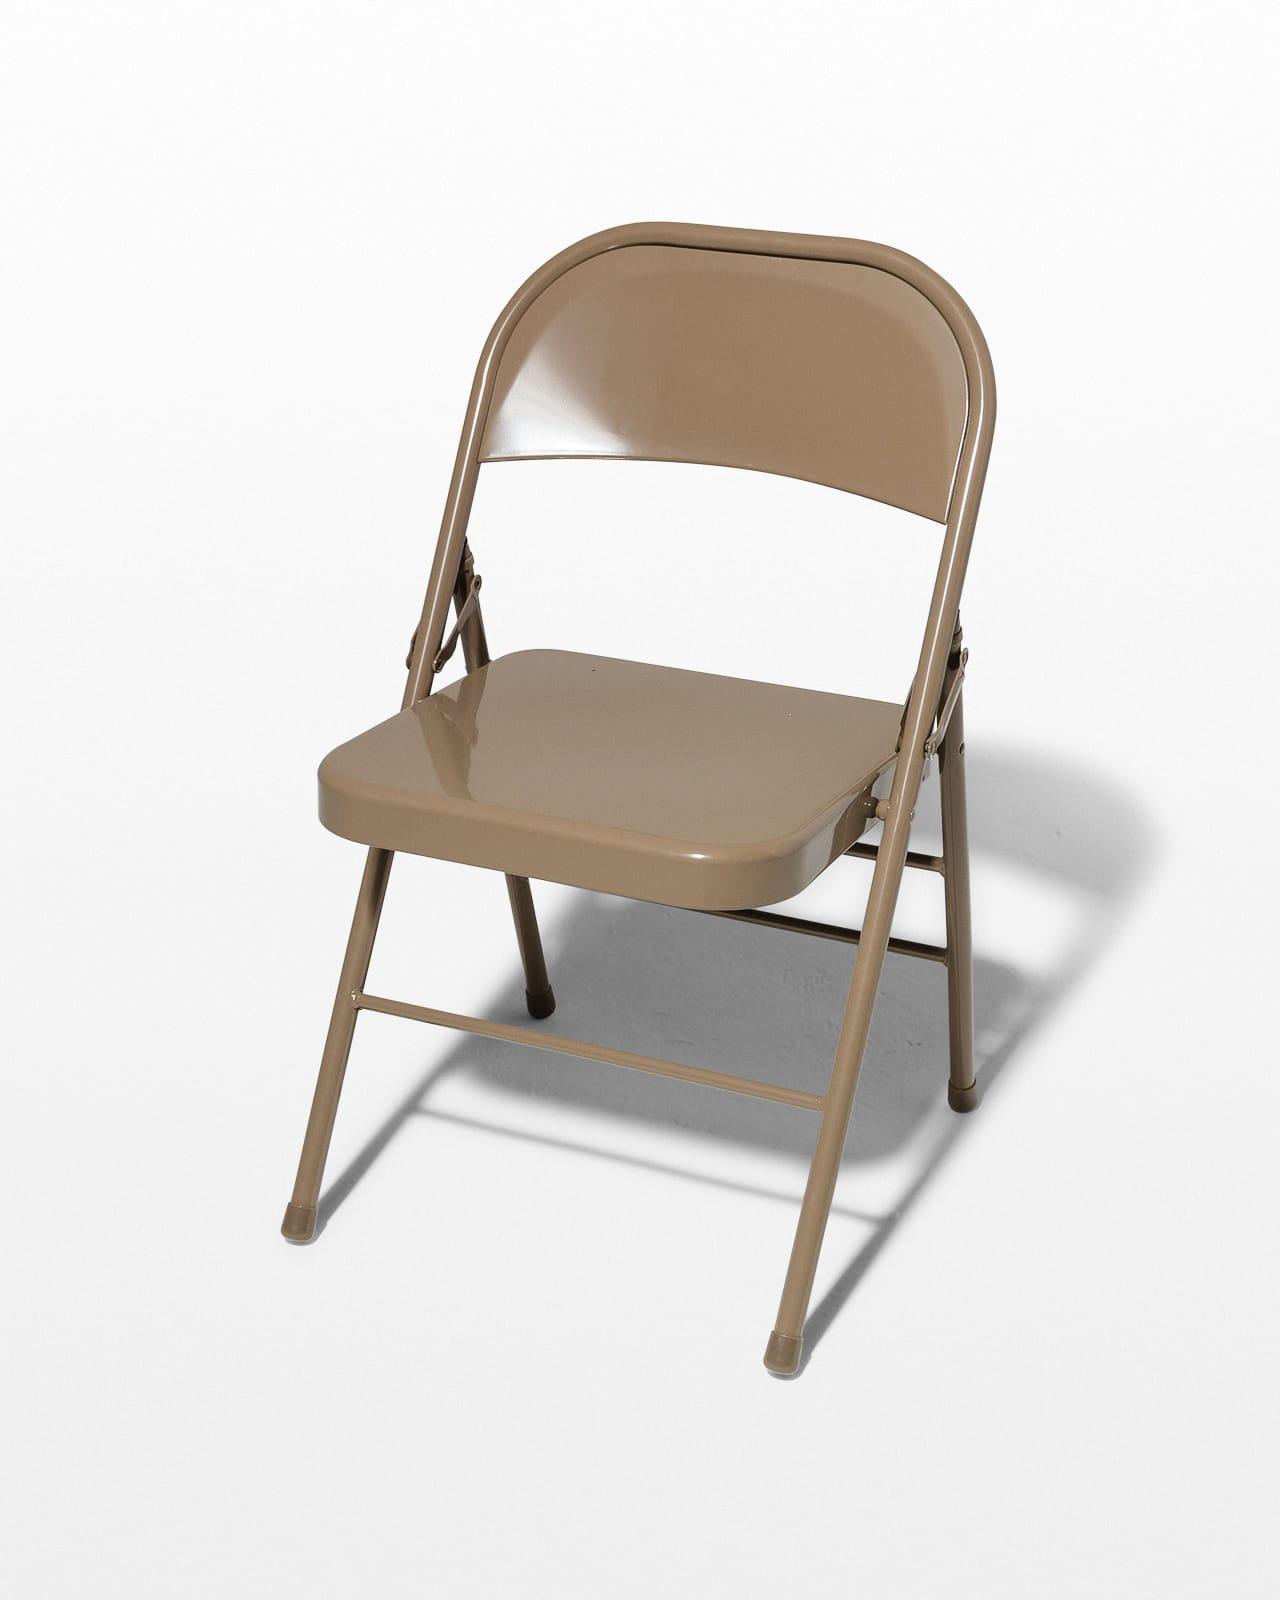 Prime Ch472 Slate Grey Folding Chair Prop Rental Acme Brooklyn Ncnpc Chair Design For Home Ncnpcorg